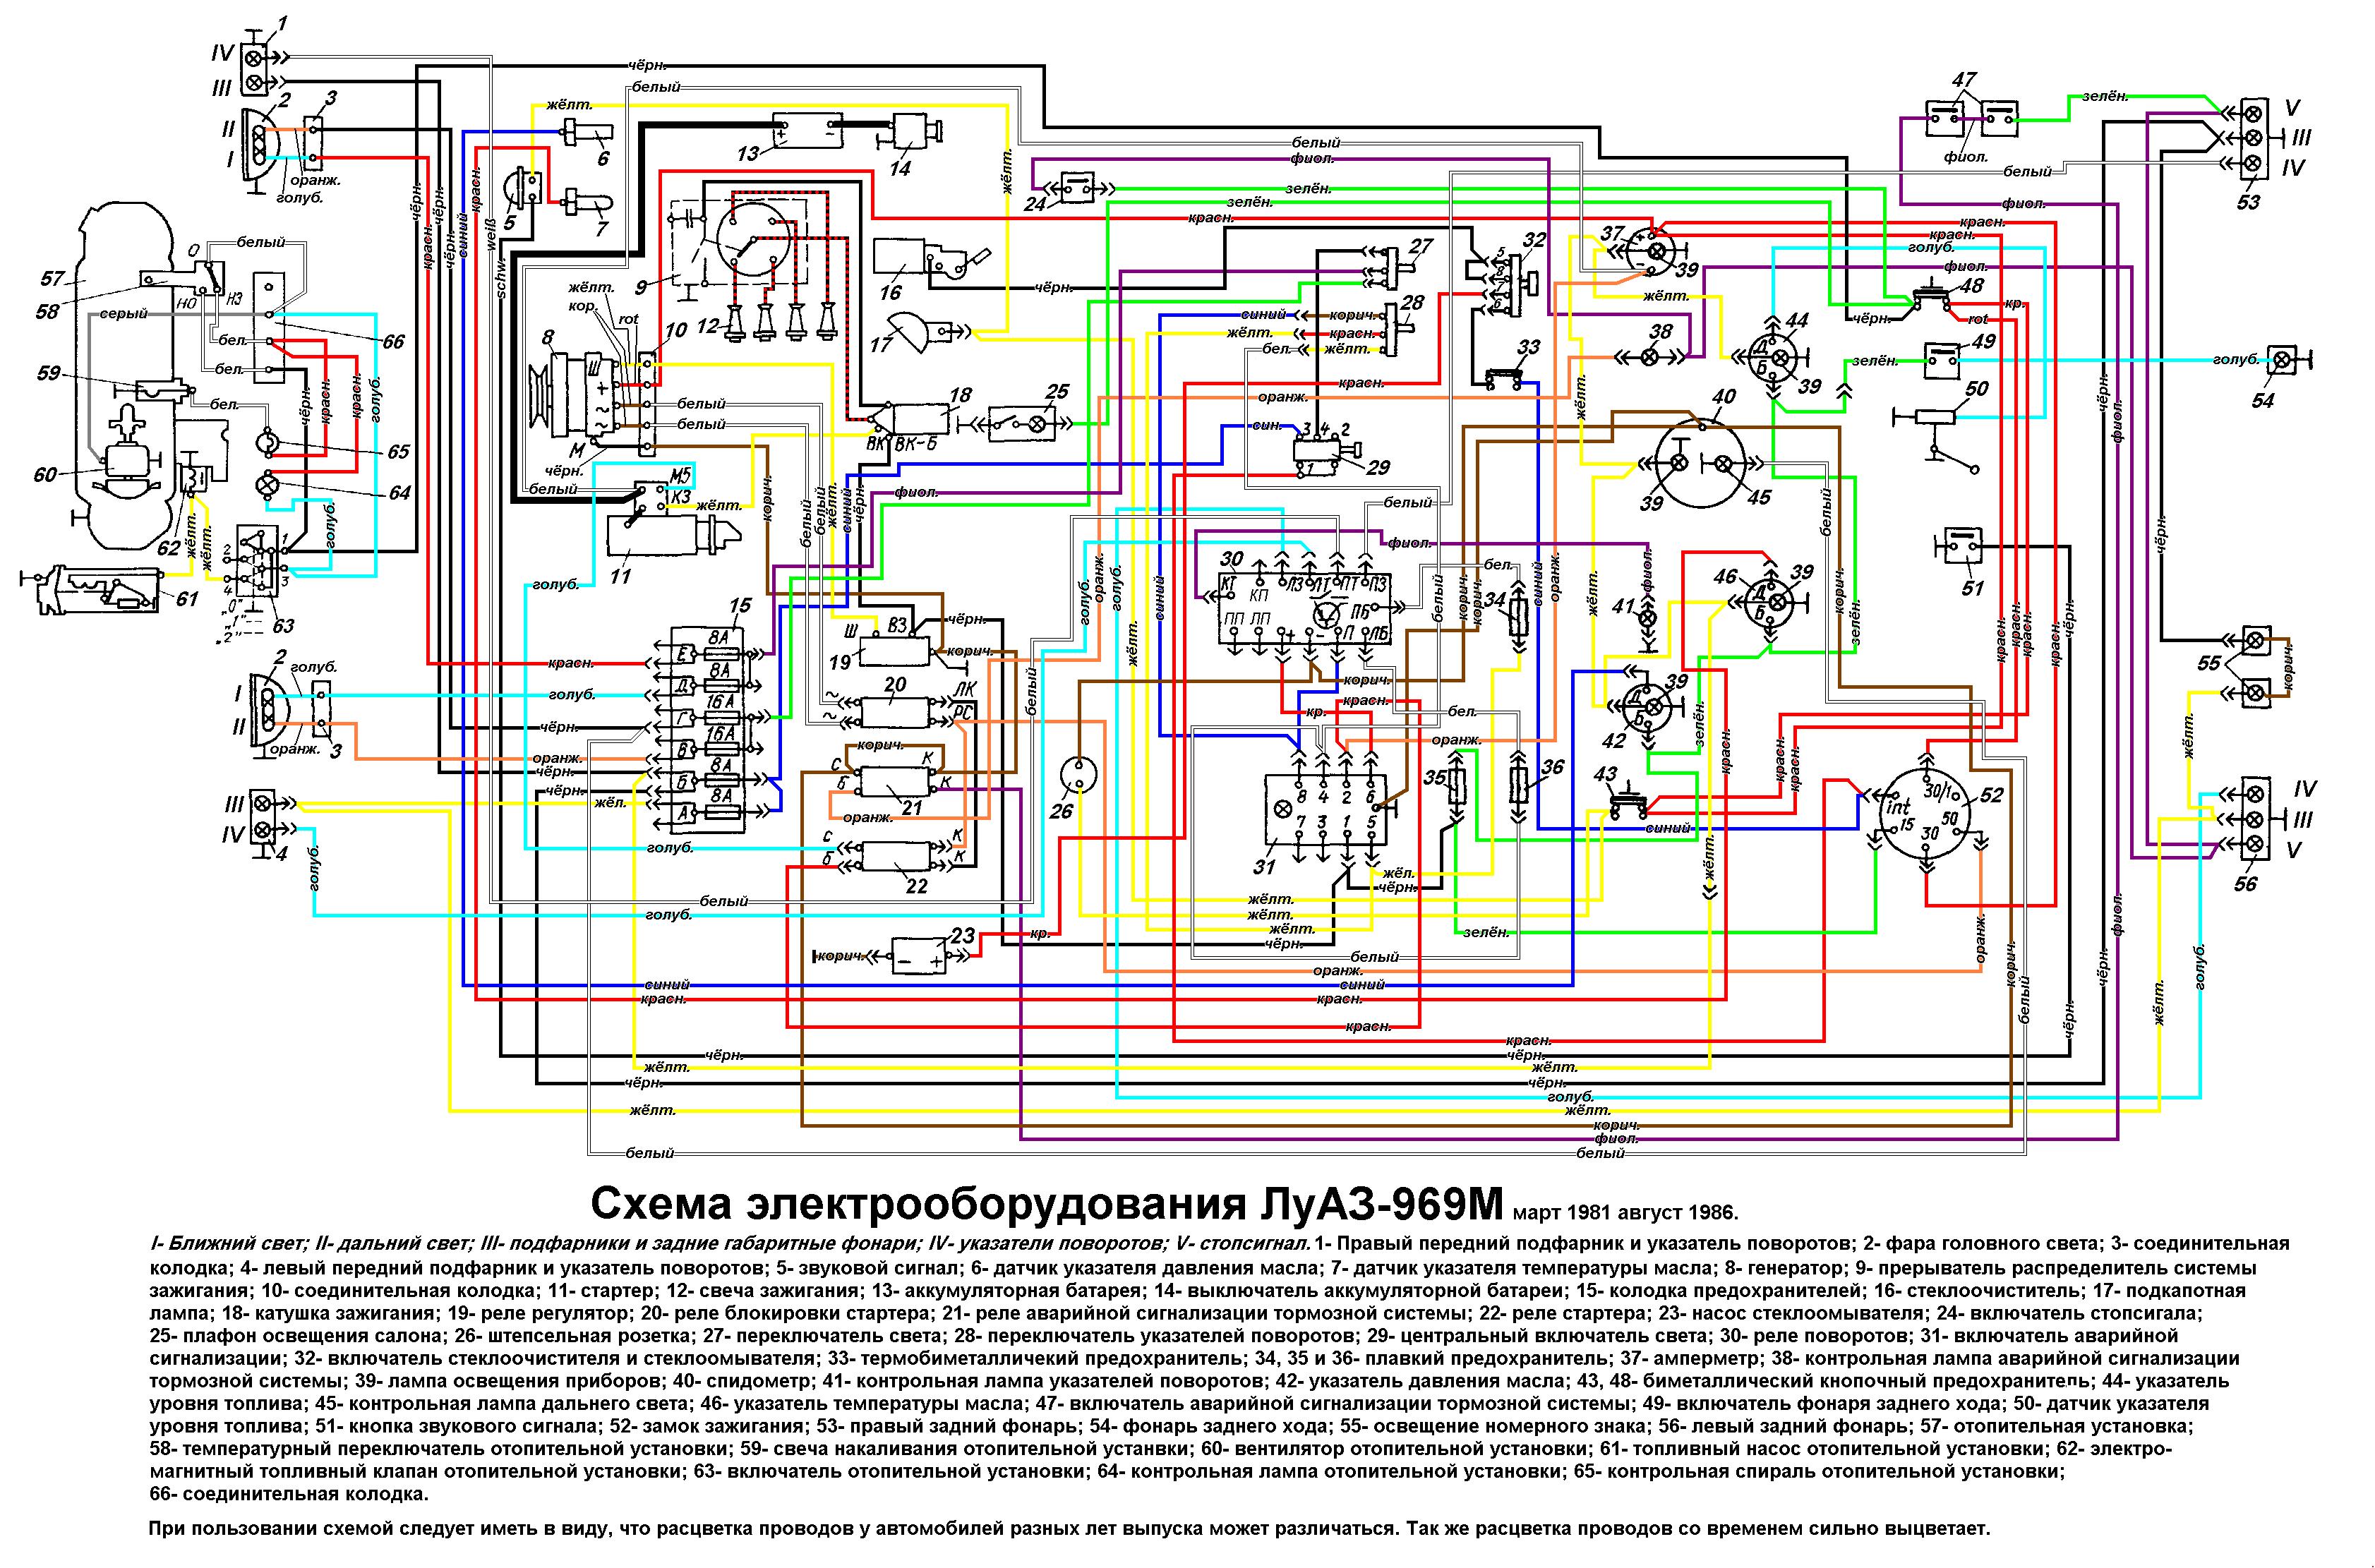 2.SP. LuAZ-969M. 03.81.-06.RUS.png